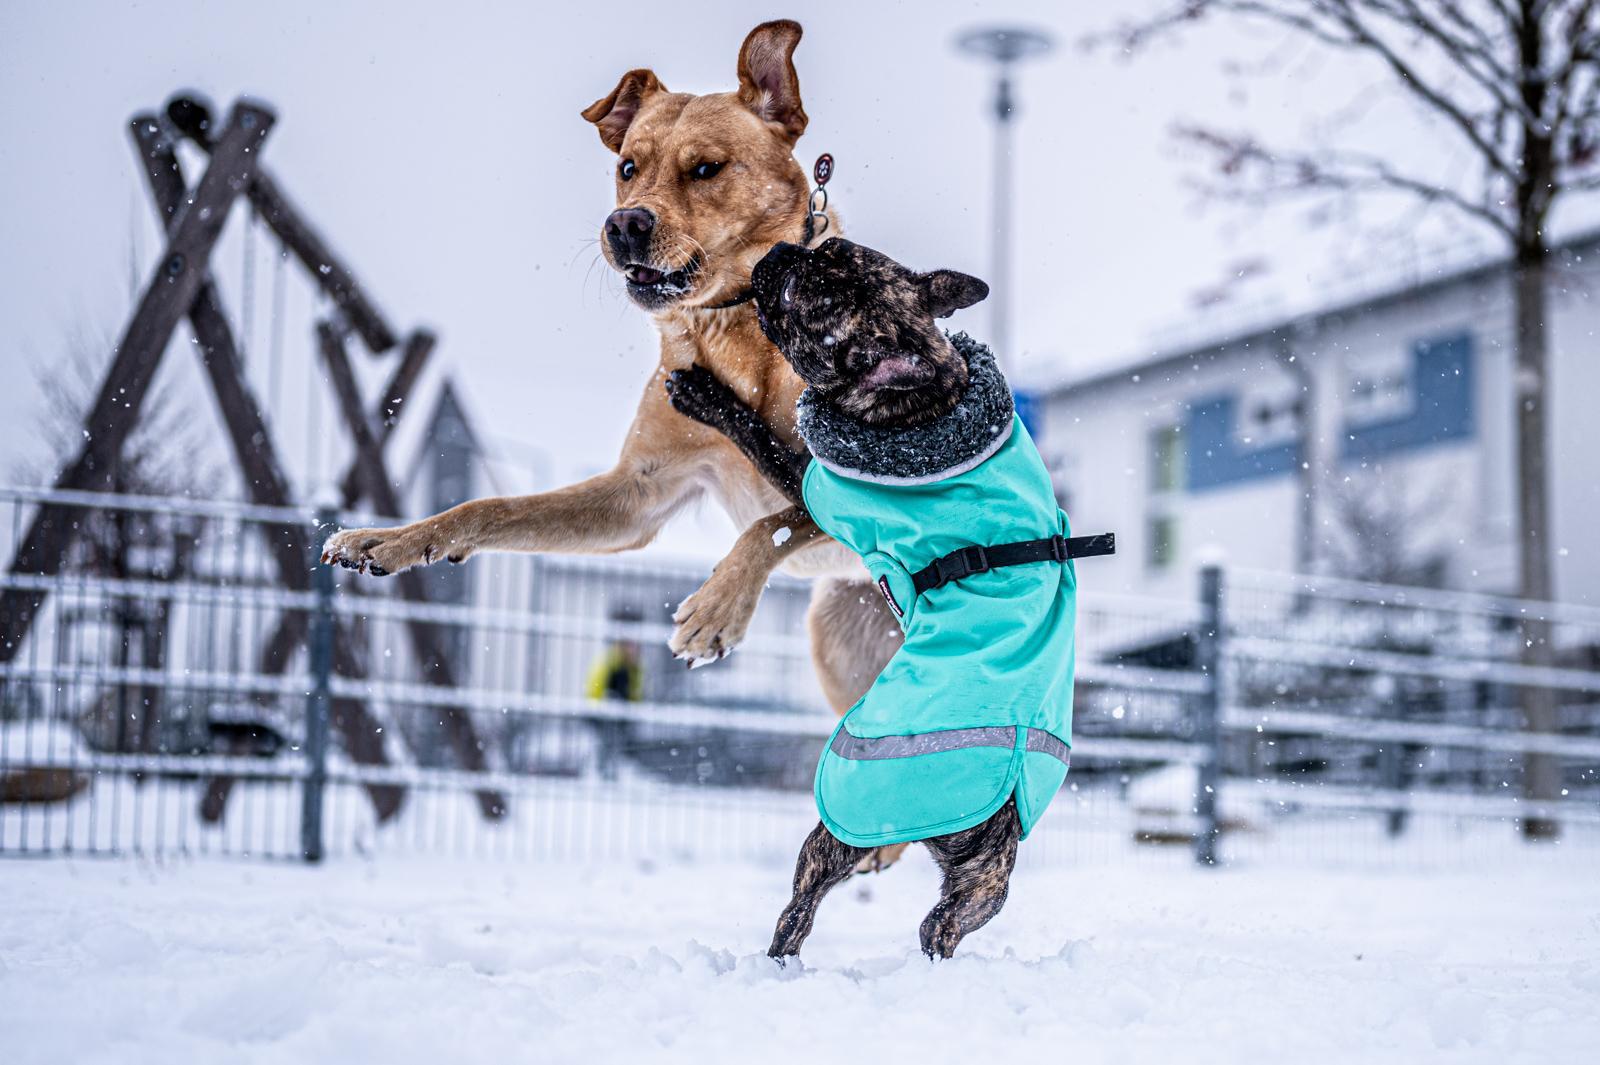 Tierfotograf-Labrador-Sven's Bildwerke-Hund-Hundefotografie22